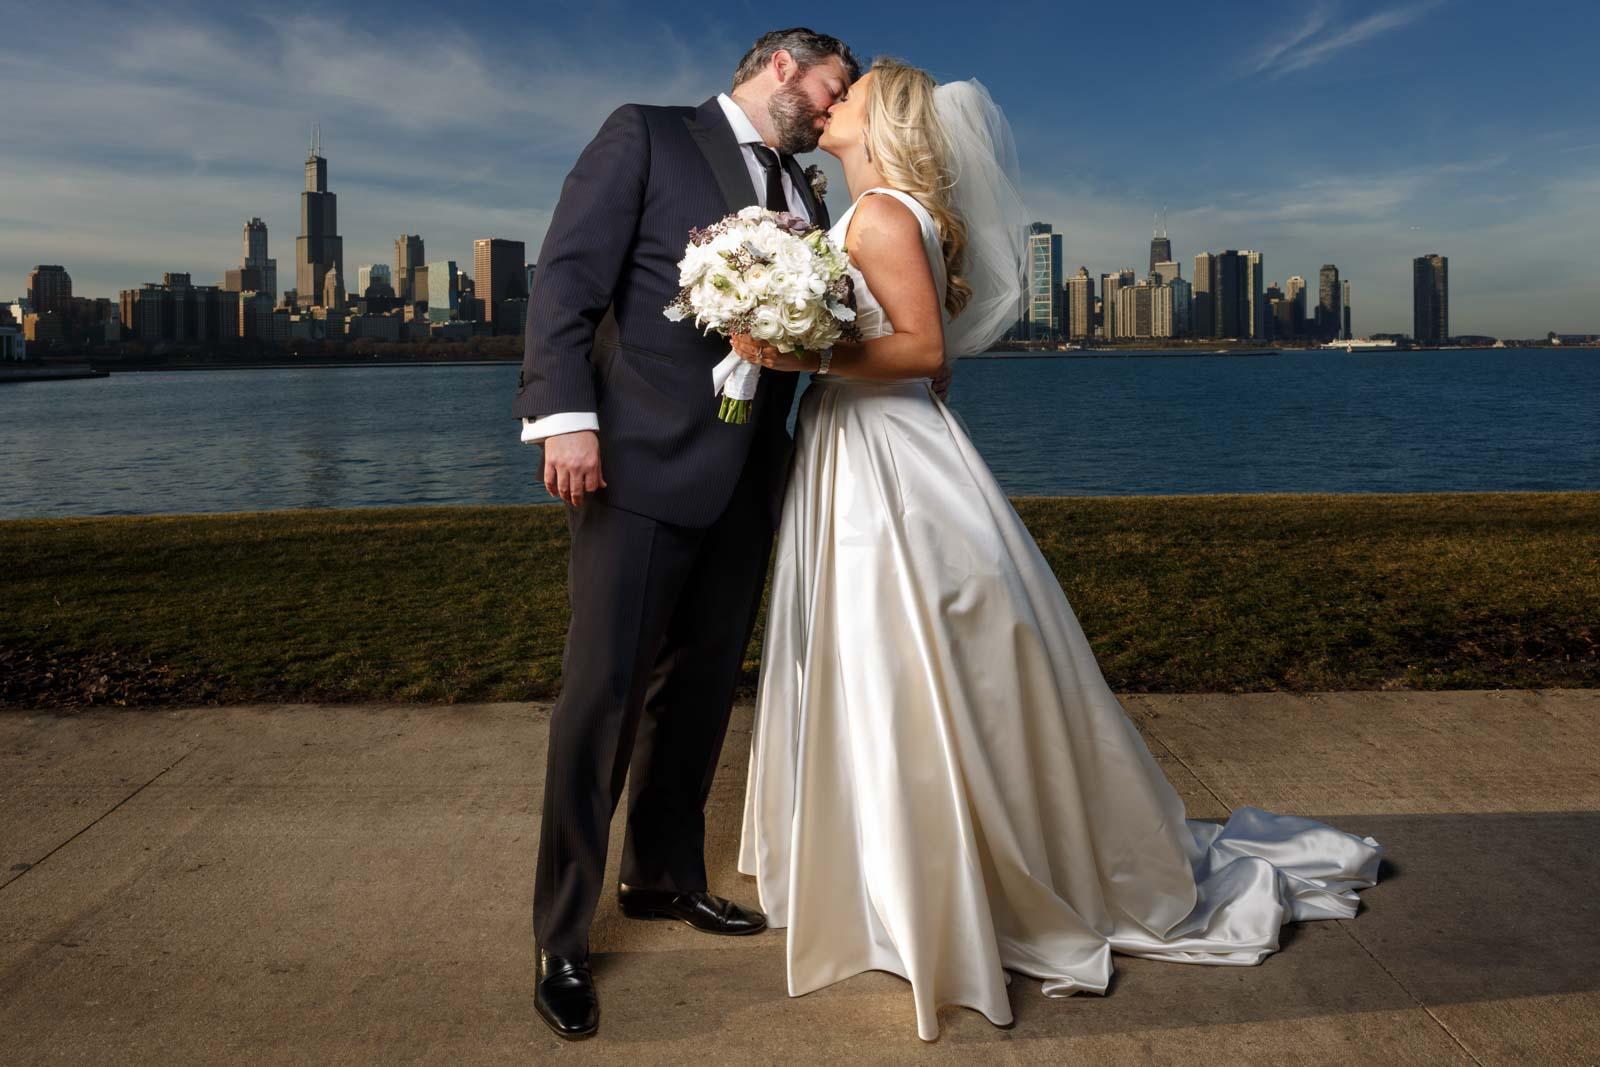 Chicago wedding photographer: Matt & Rebecca at the Union League Club